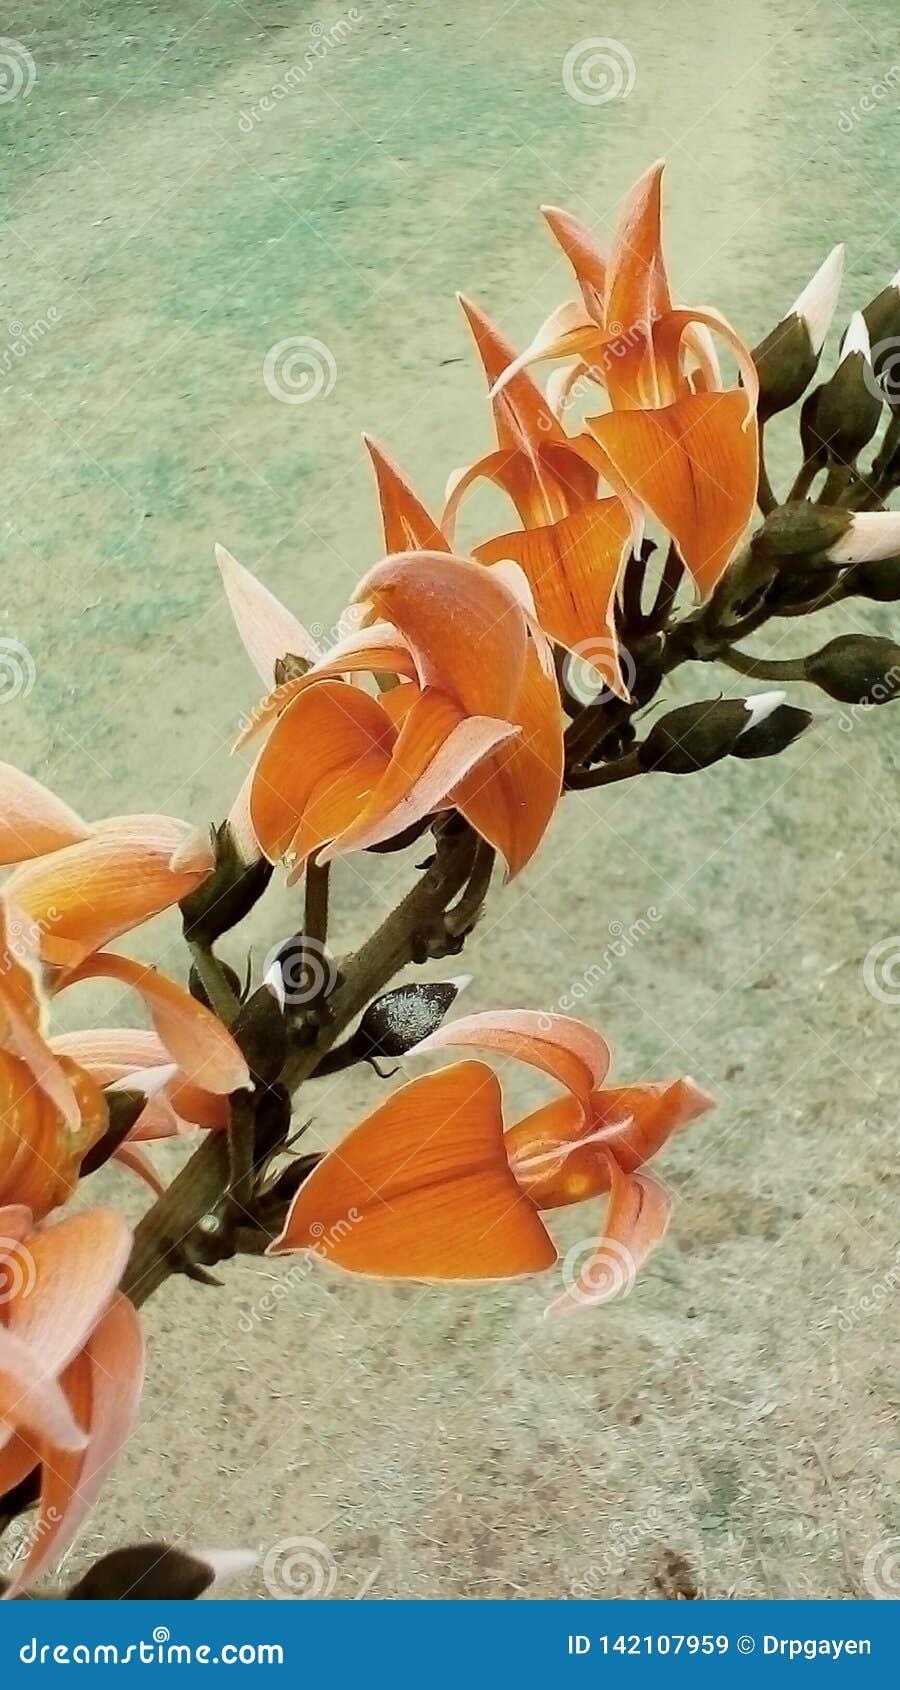 Lös djup orange kulör blomma i skogfältet & x22; Skogsbrand & x22; blomma